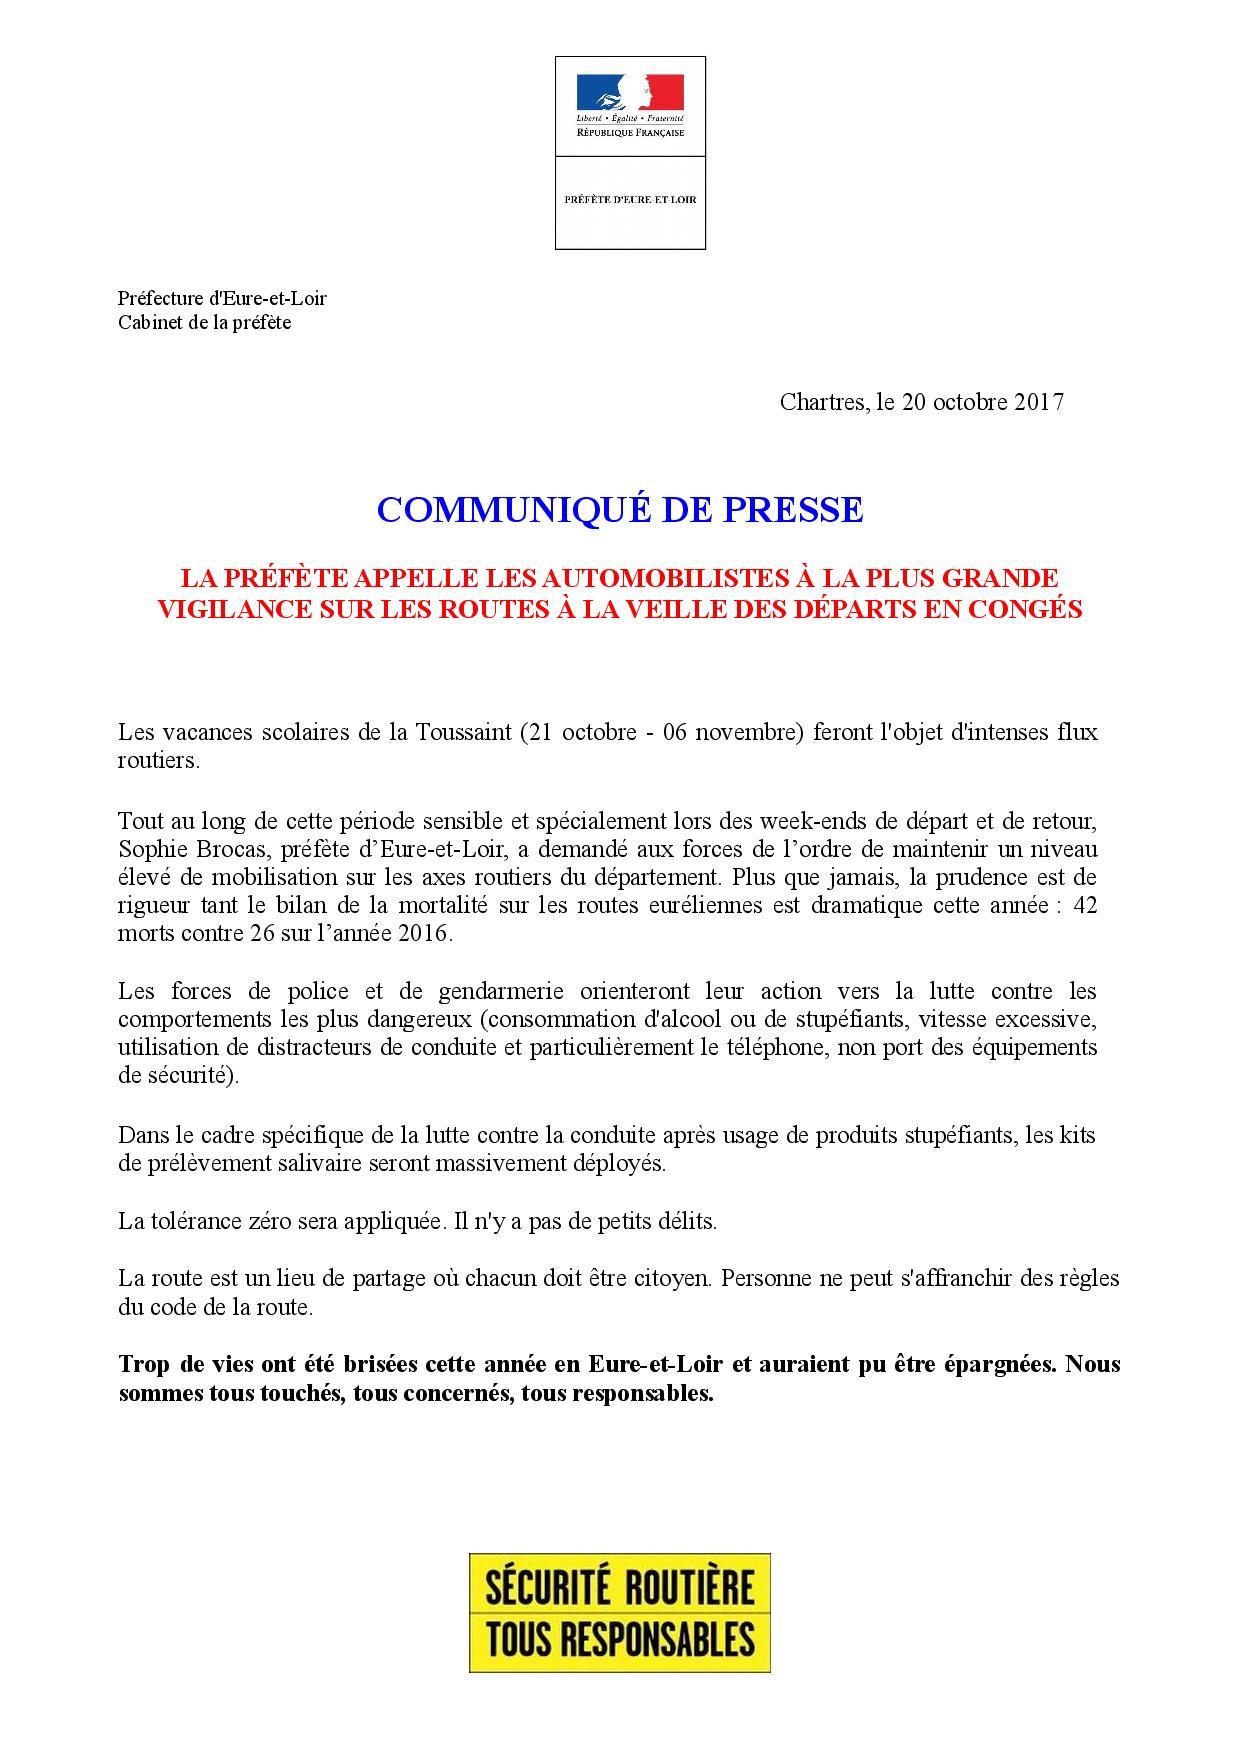 communique-de-presse-20-10-207